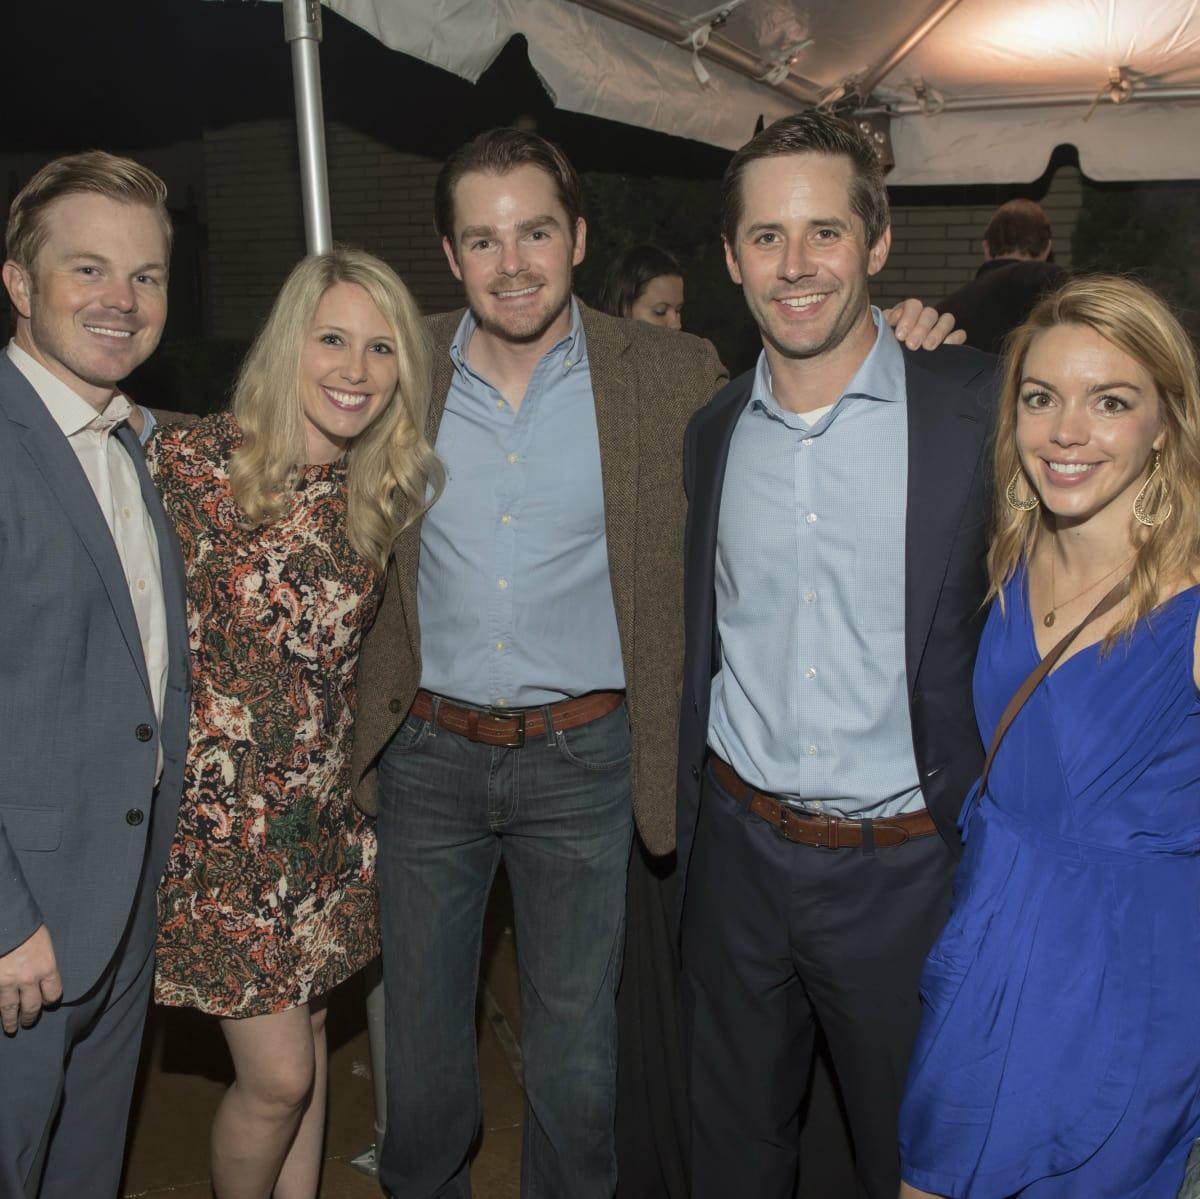 Clay Pickering, Erin Pickering, Chris Baker, Austin Anderson, Kristen Huffman